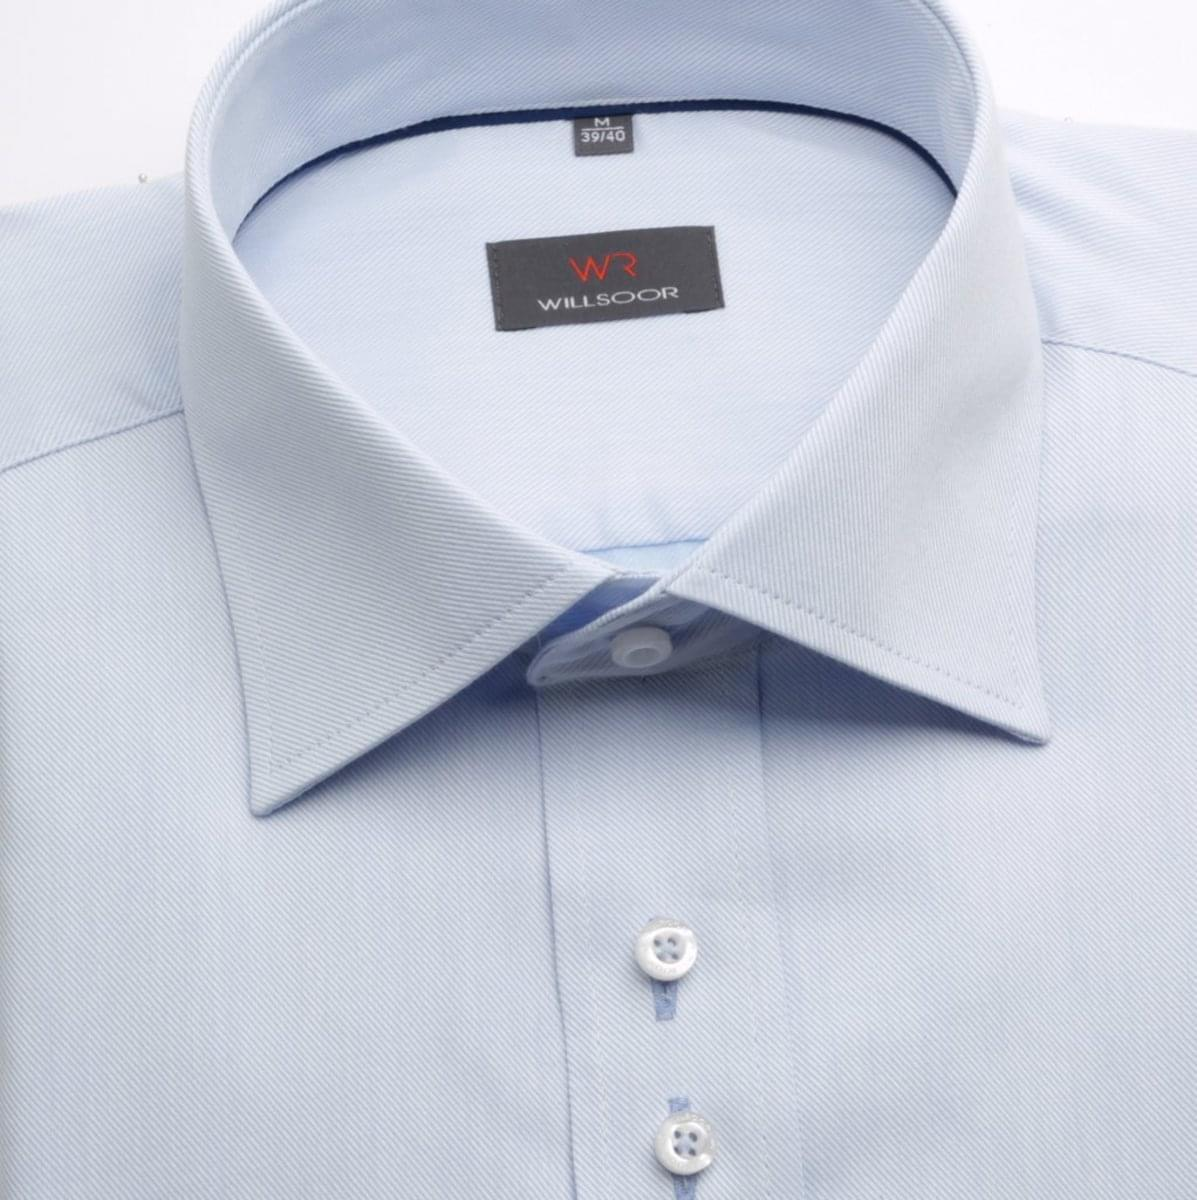 Willsoor Košile WR Slim Fit (výška 188-194) 3684 188-194 / XL (43/44)